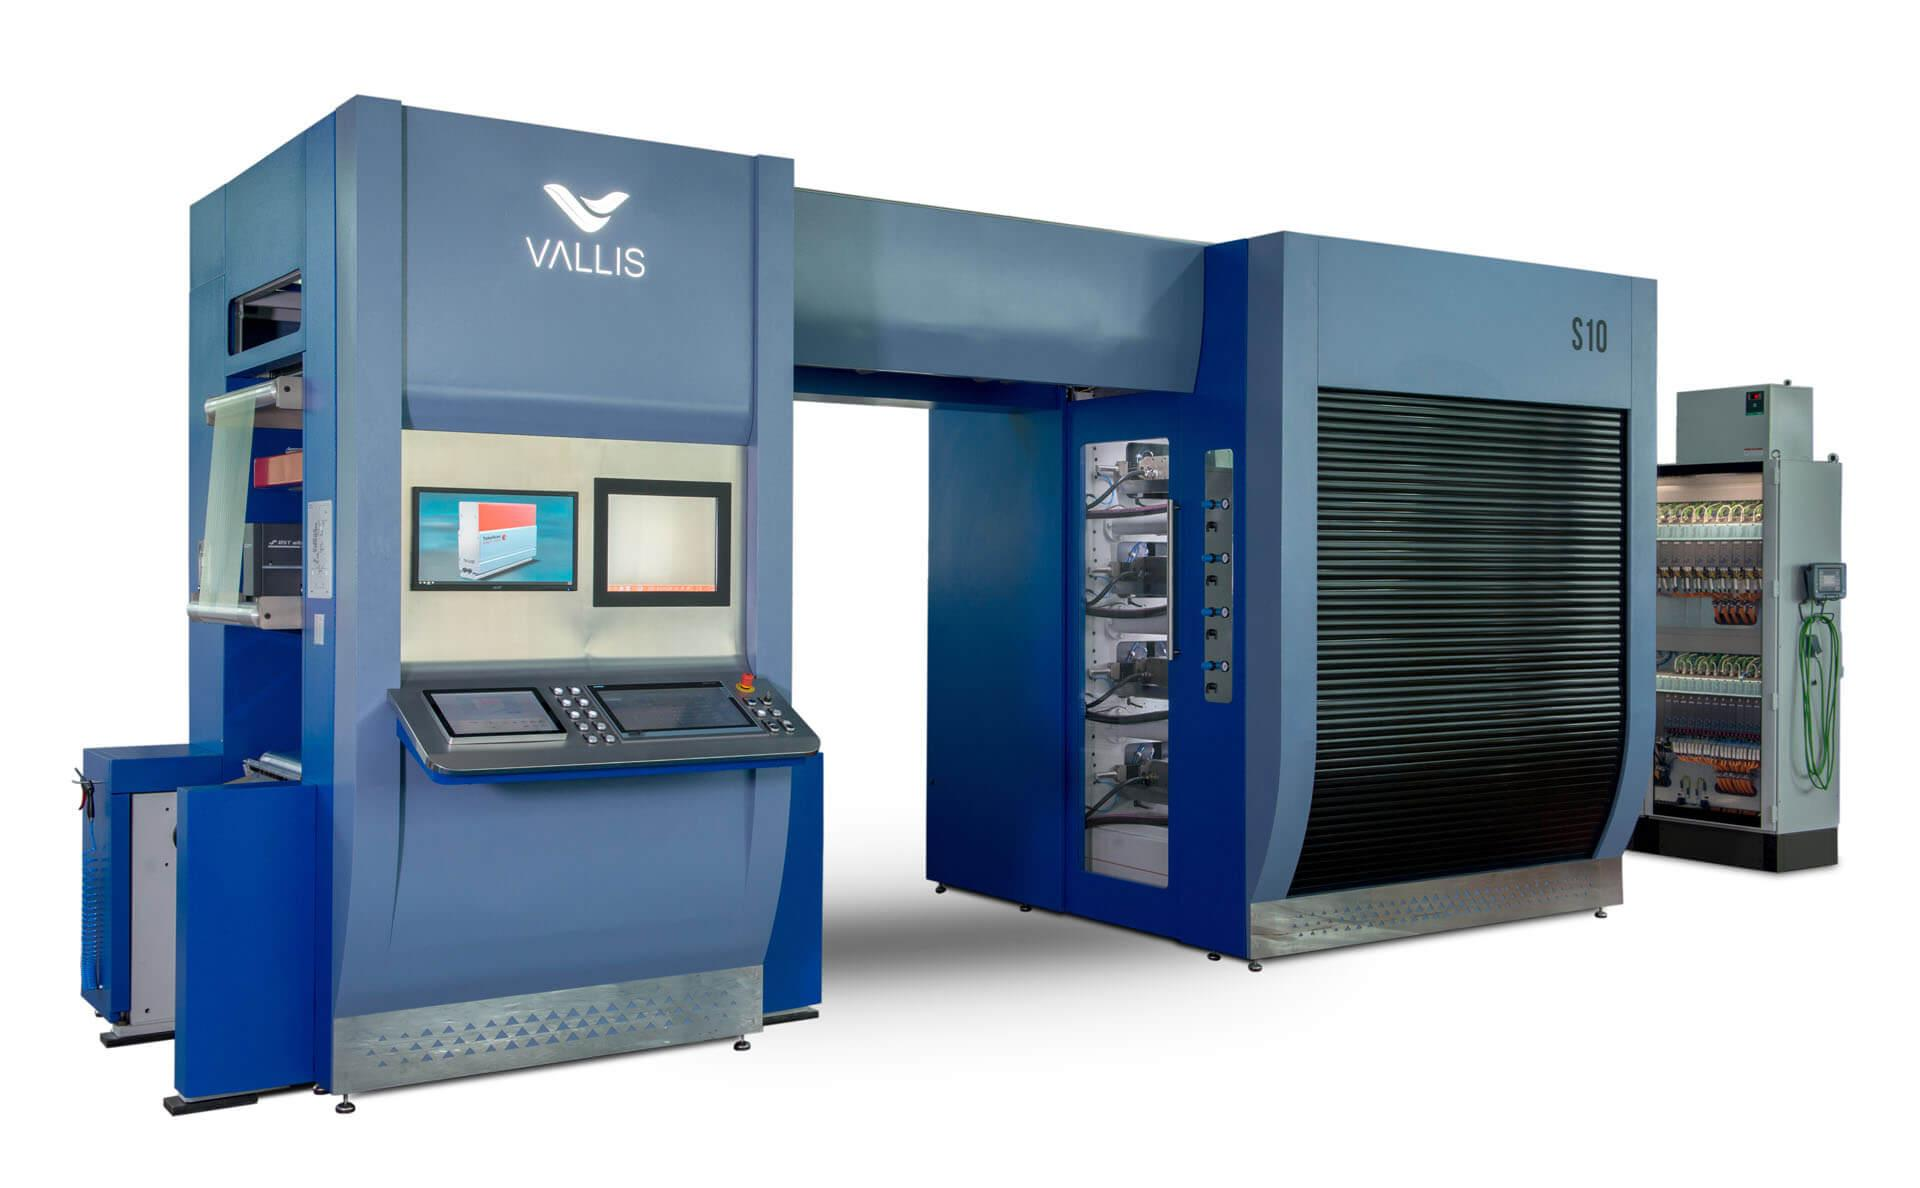 flexo-printing-machine-S10-vallis-01